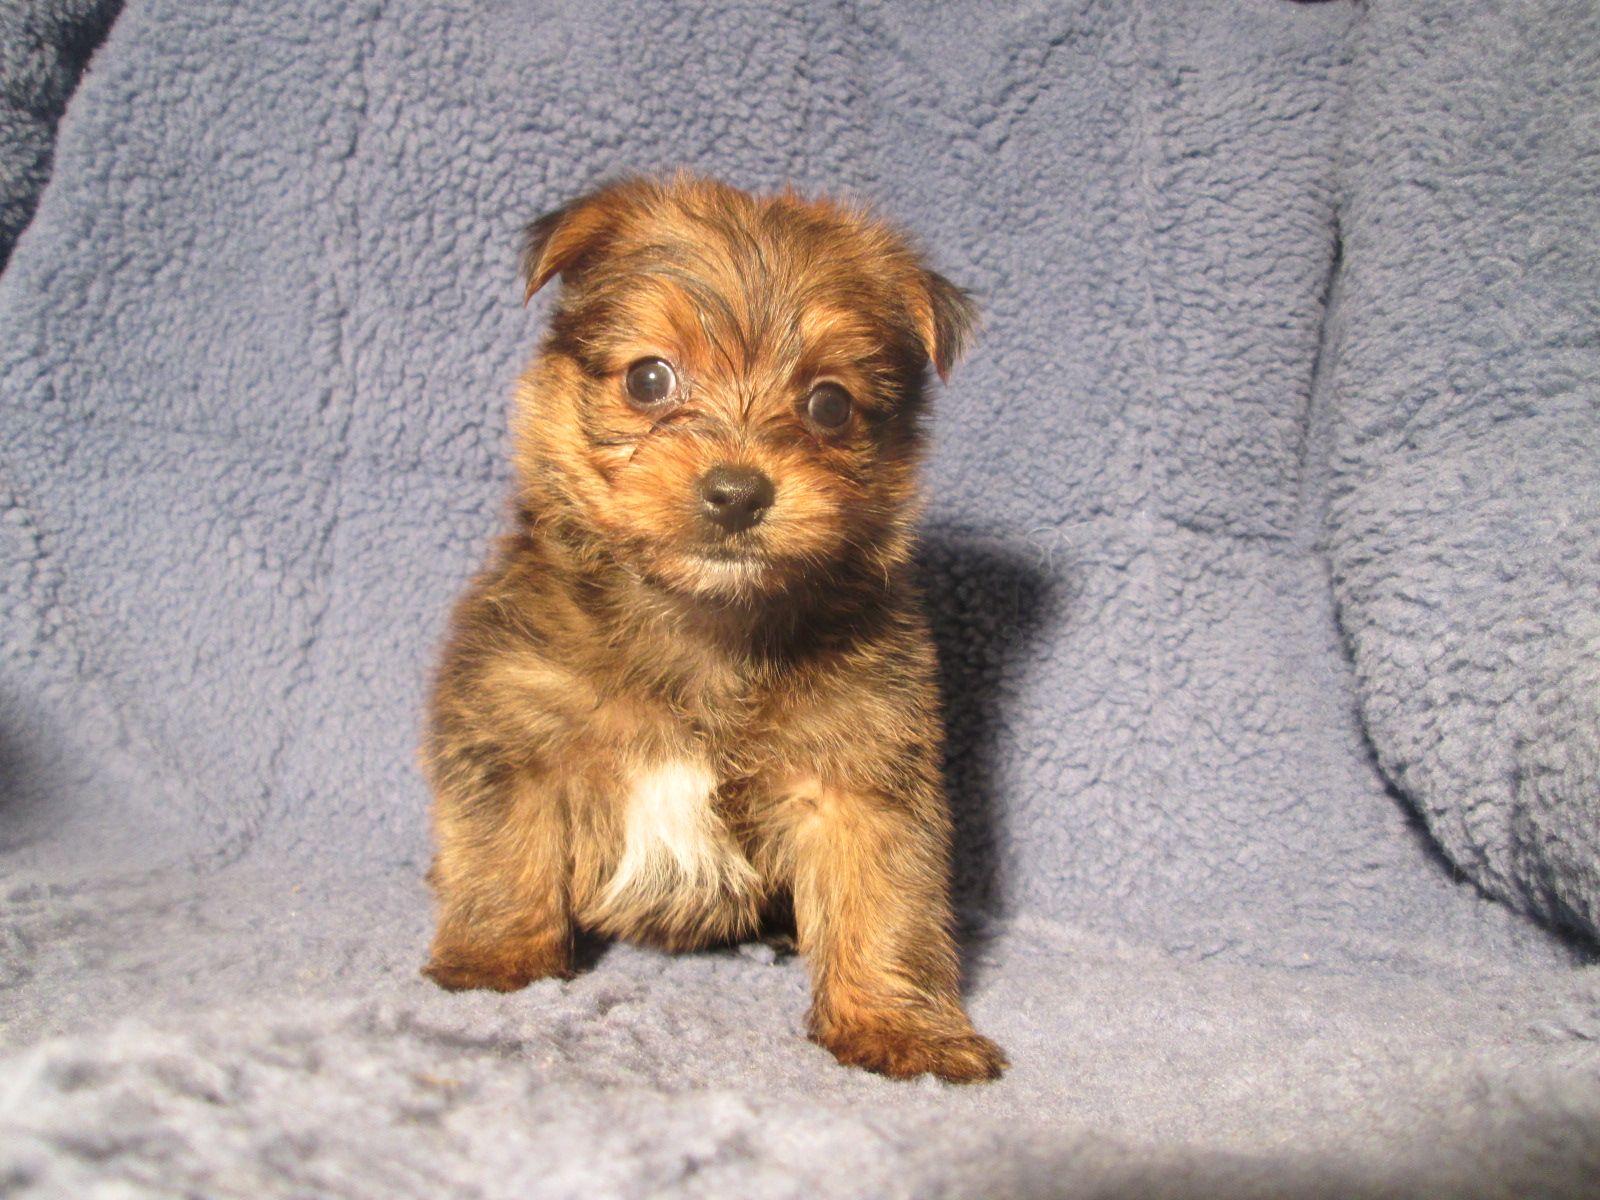 Loving Yopom Puppies Available Yorkie X Pomeranian 8 12